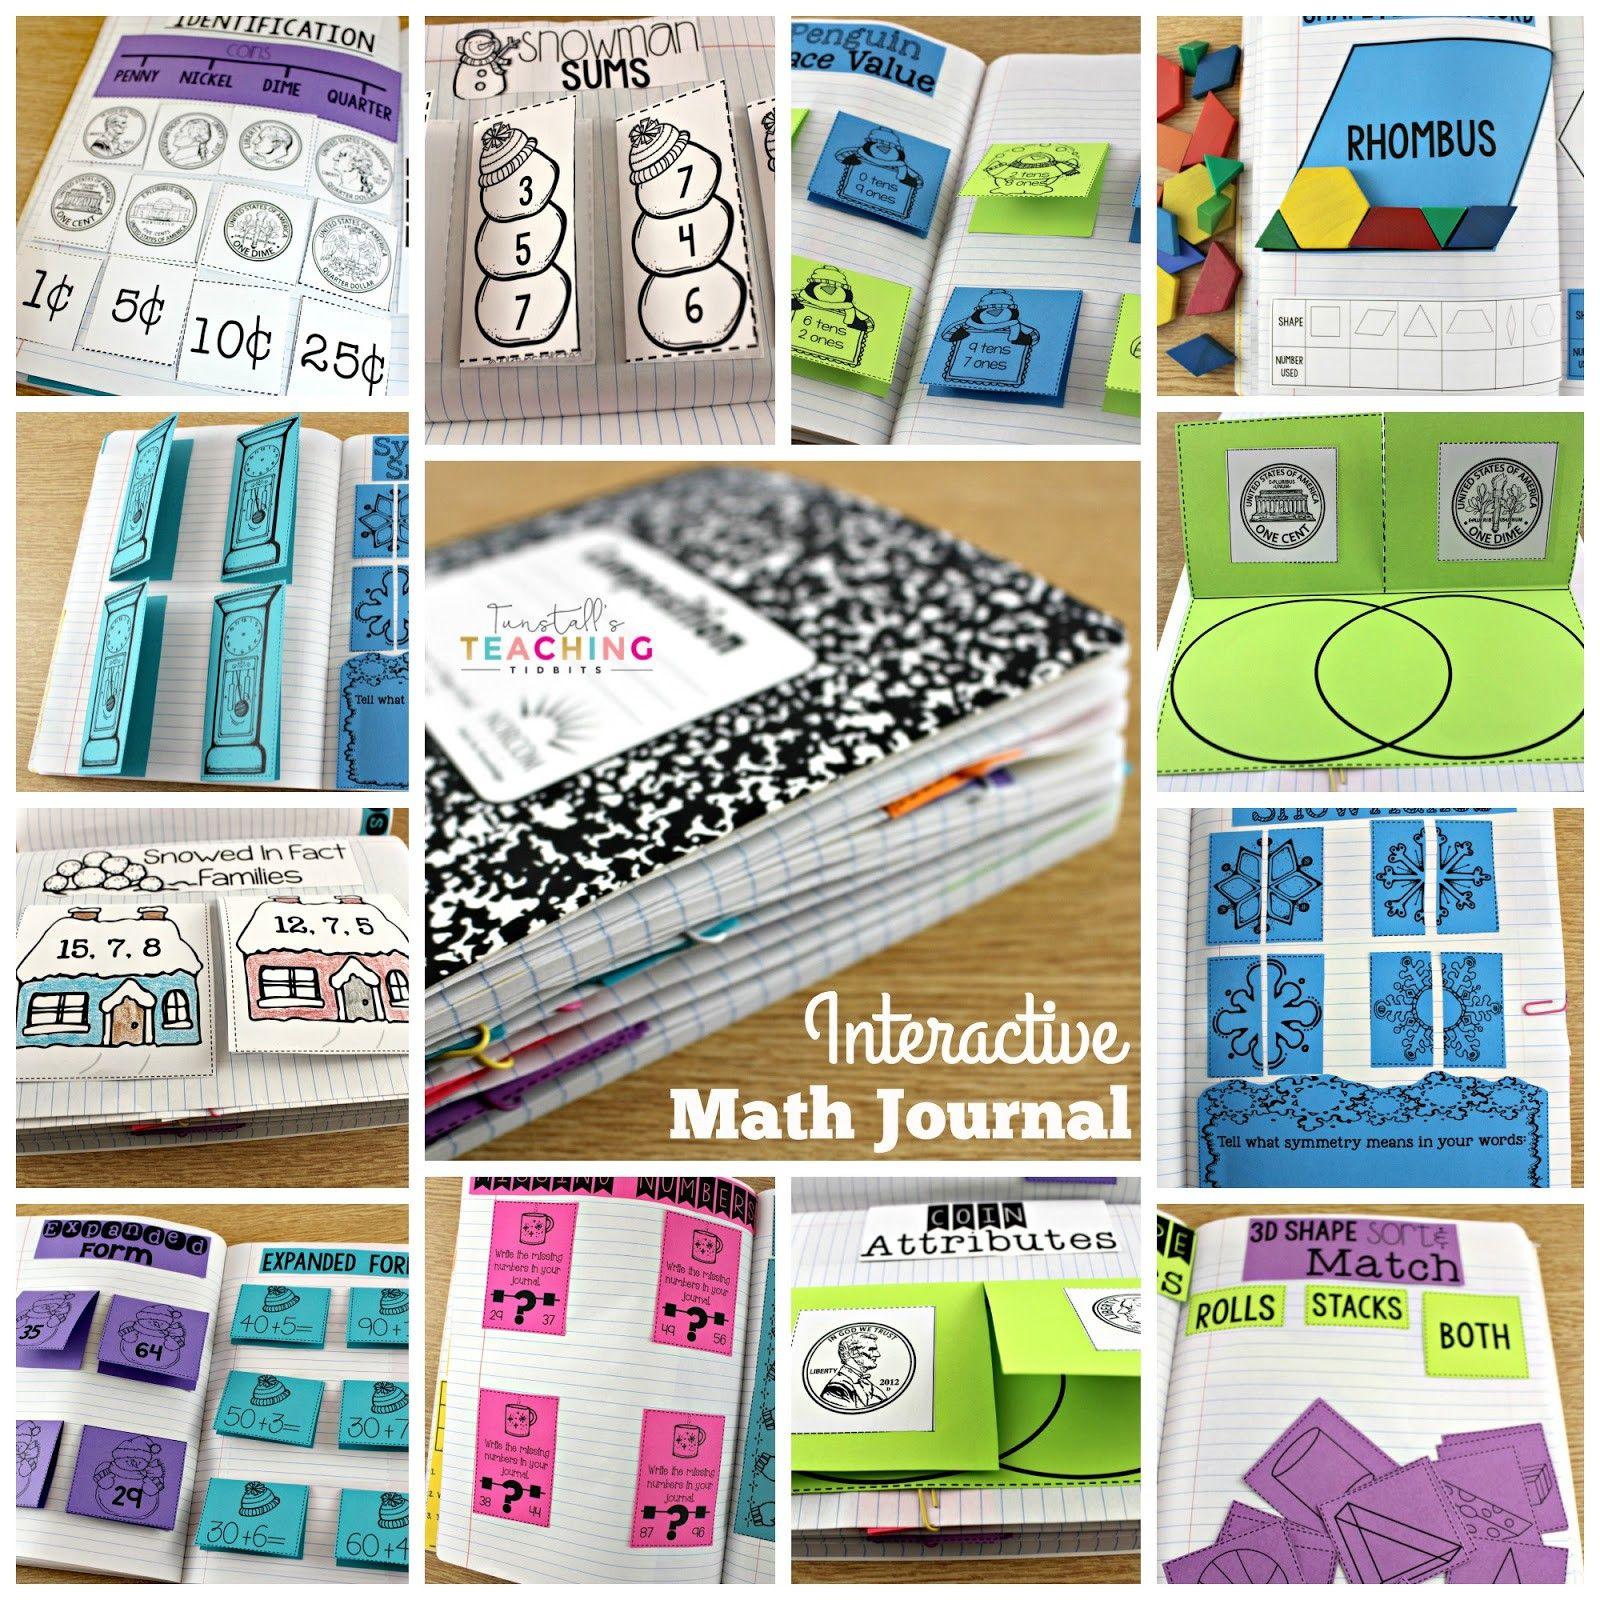 4 Free Math Worksheets Third Grade 3 Addition Adding Whole